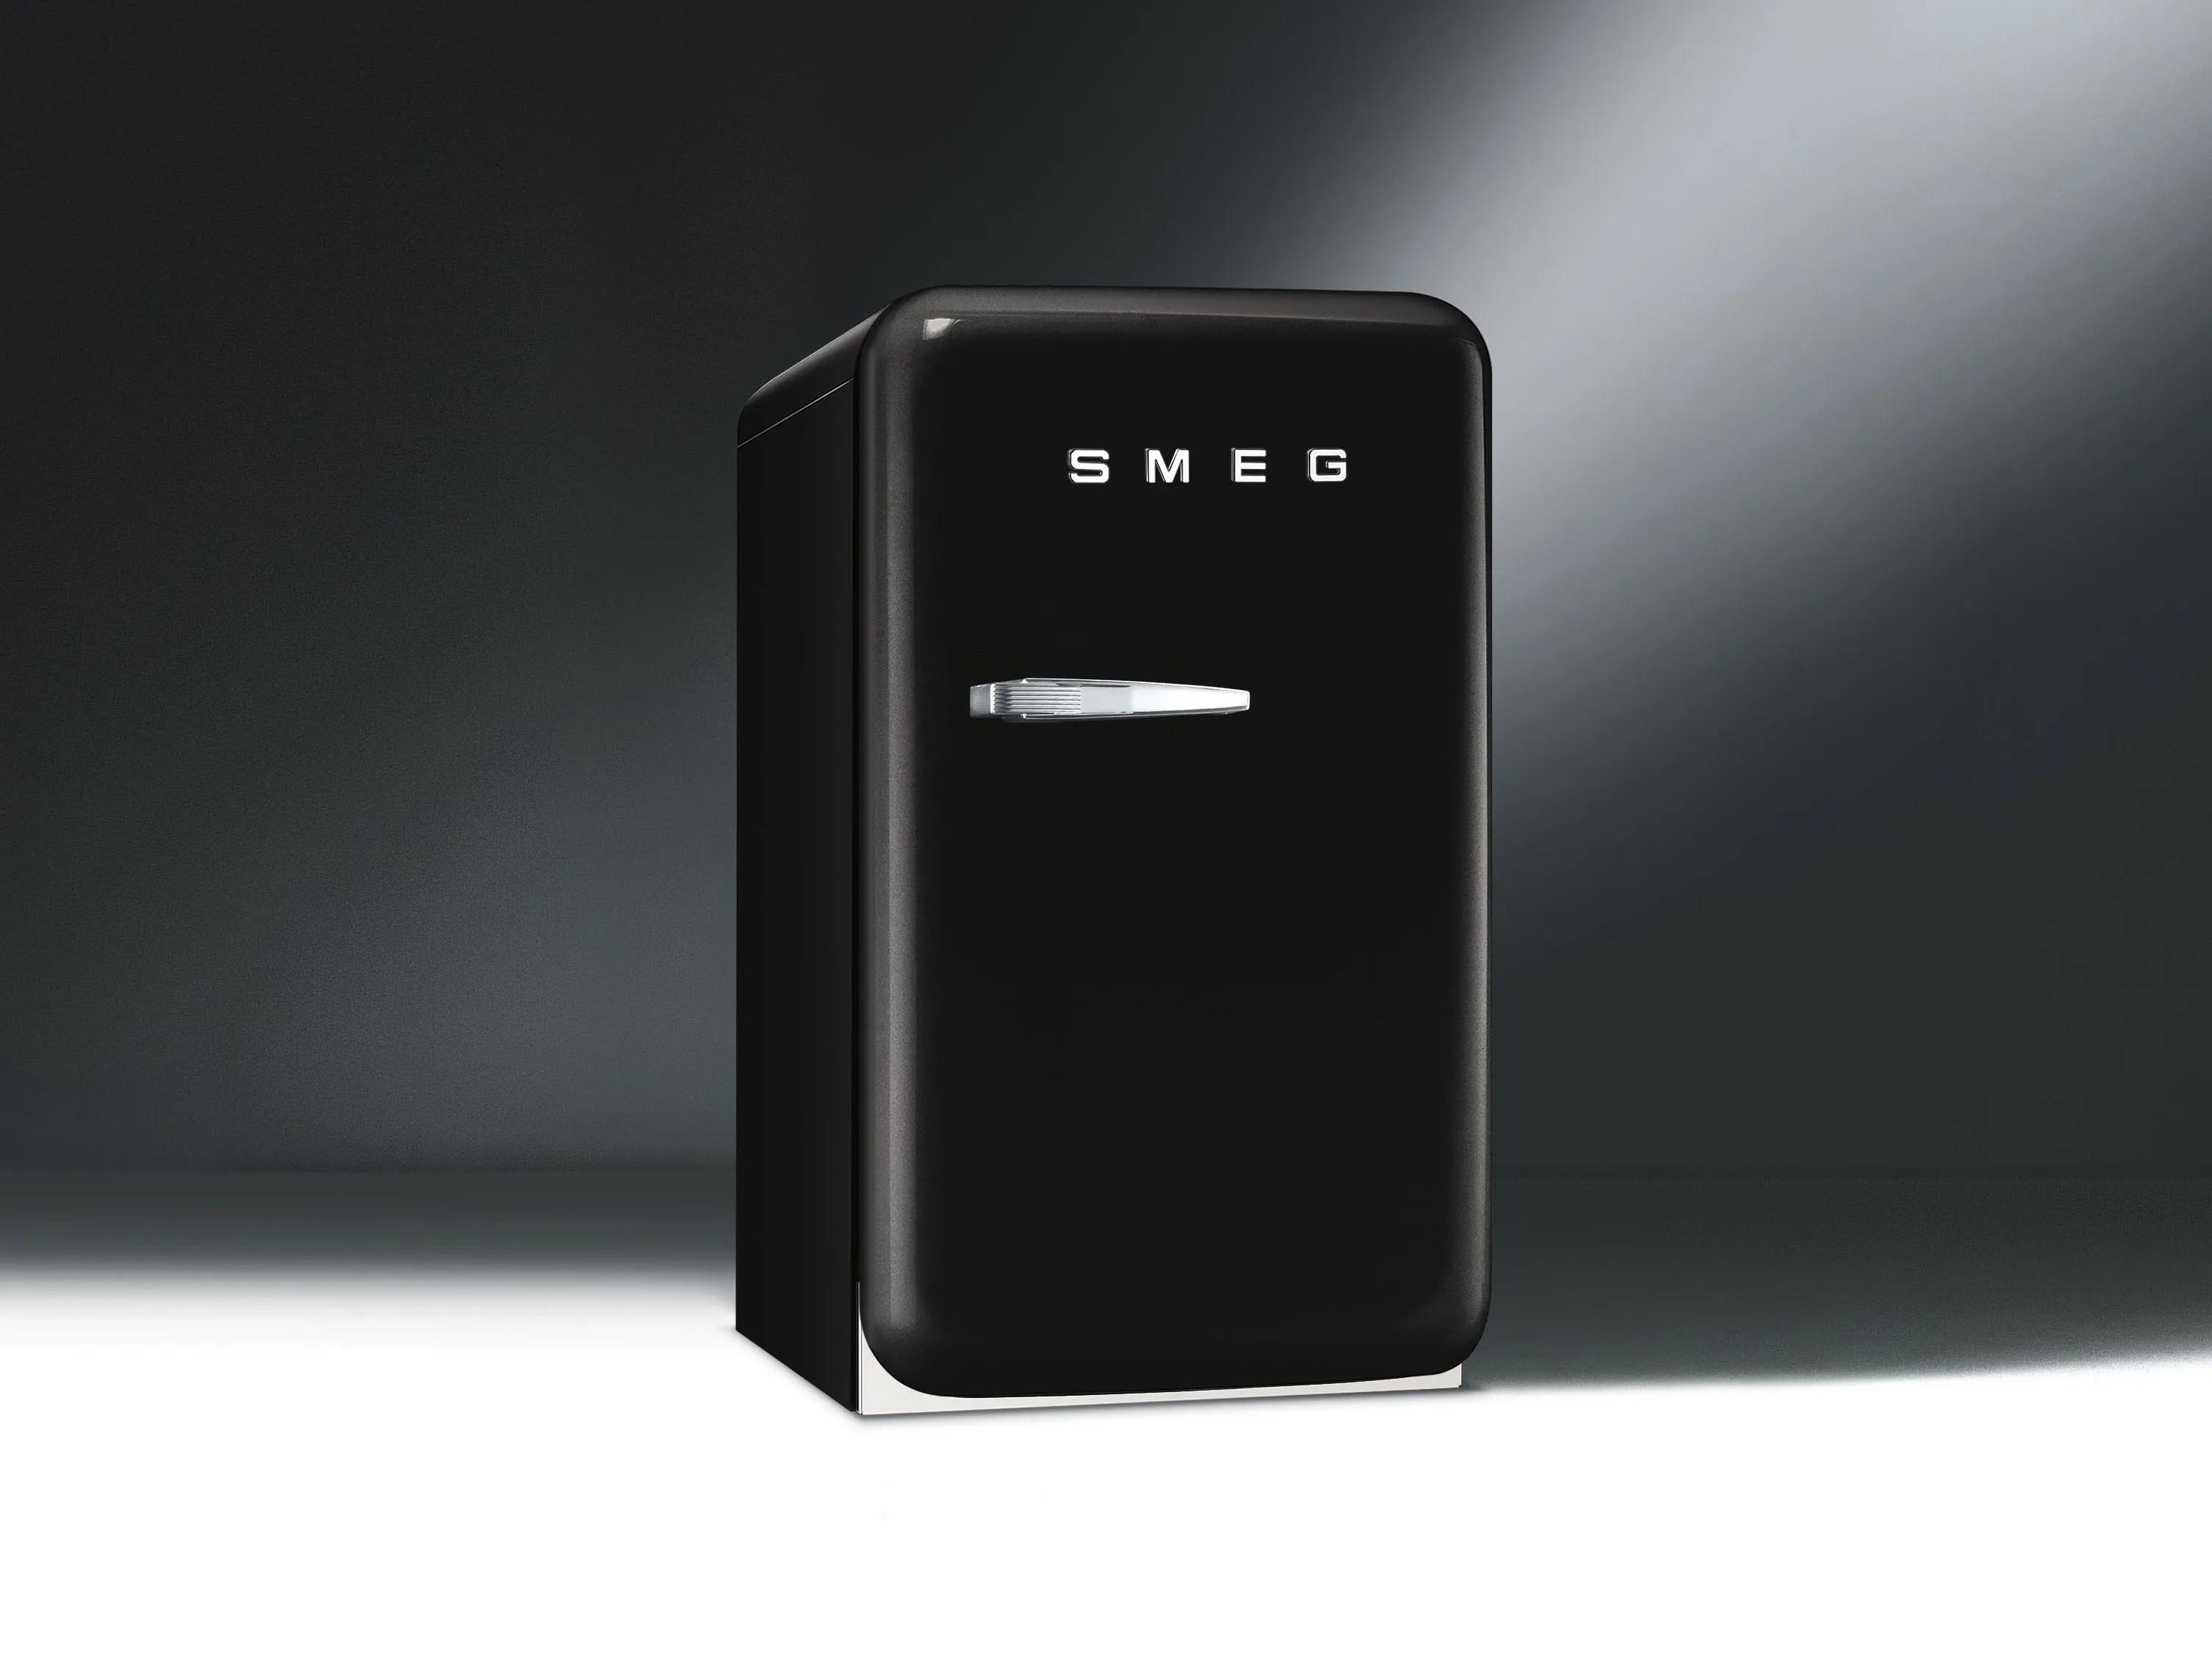 Minibar Kühlschrank Real : Mini kühlschrank bei real kühlschrank mini finebuy mini